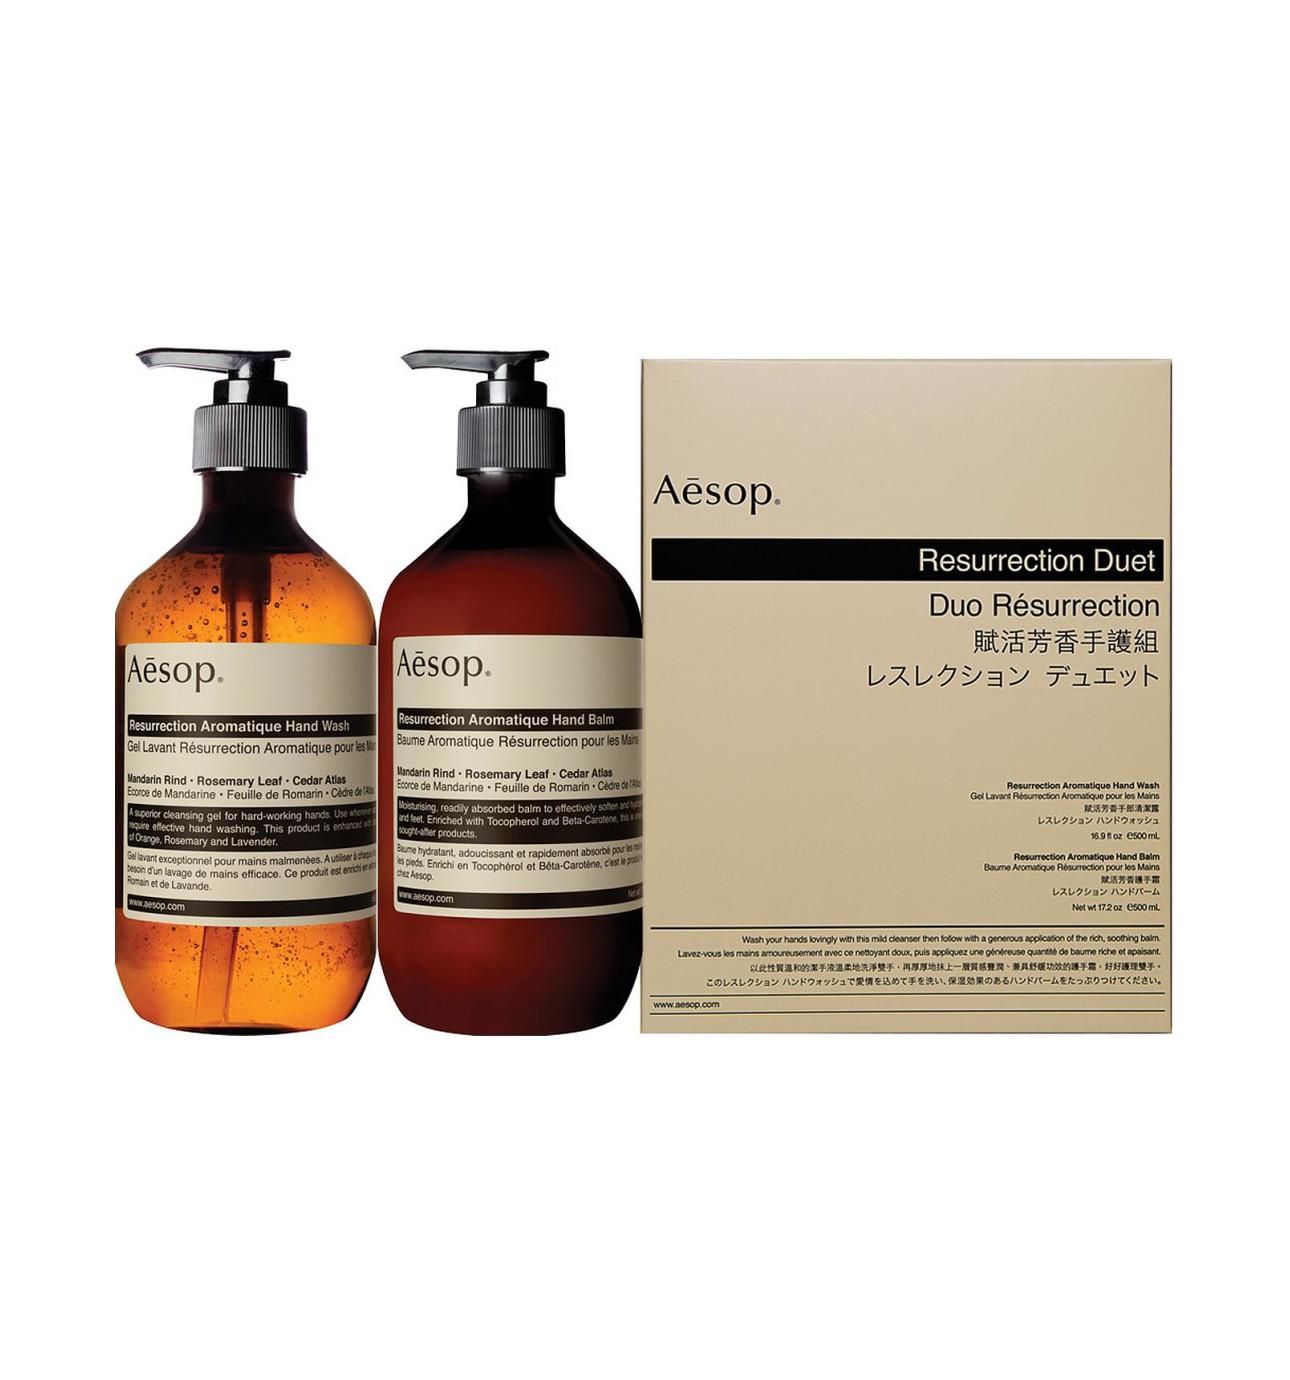 Aesop Perfume | Aesop Amazon | Aesop Hand Soap